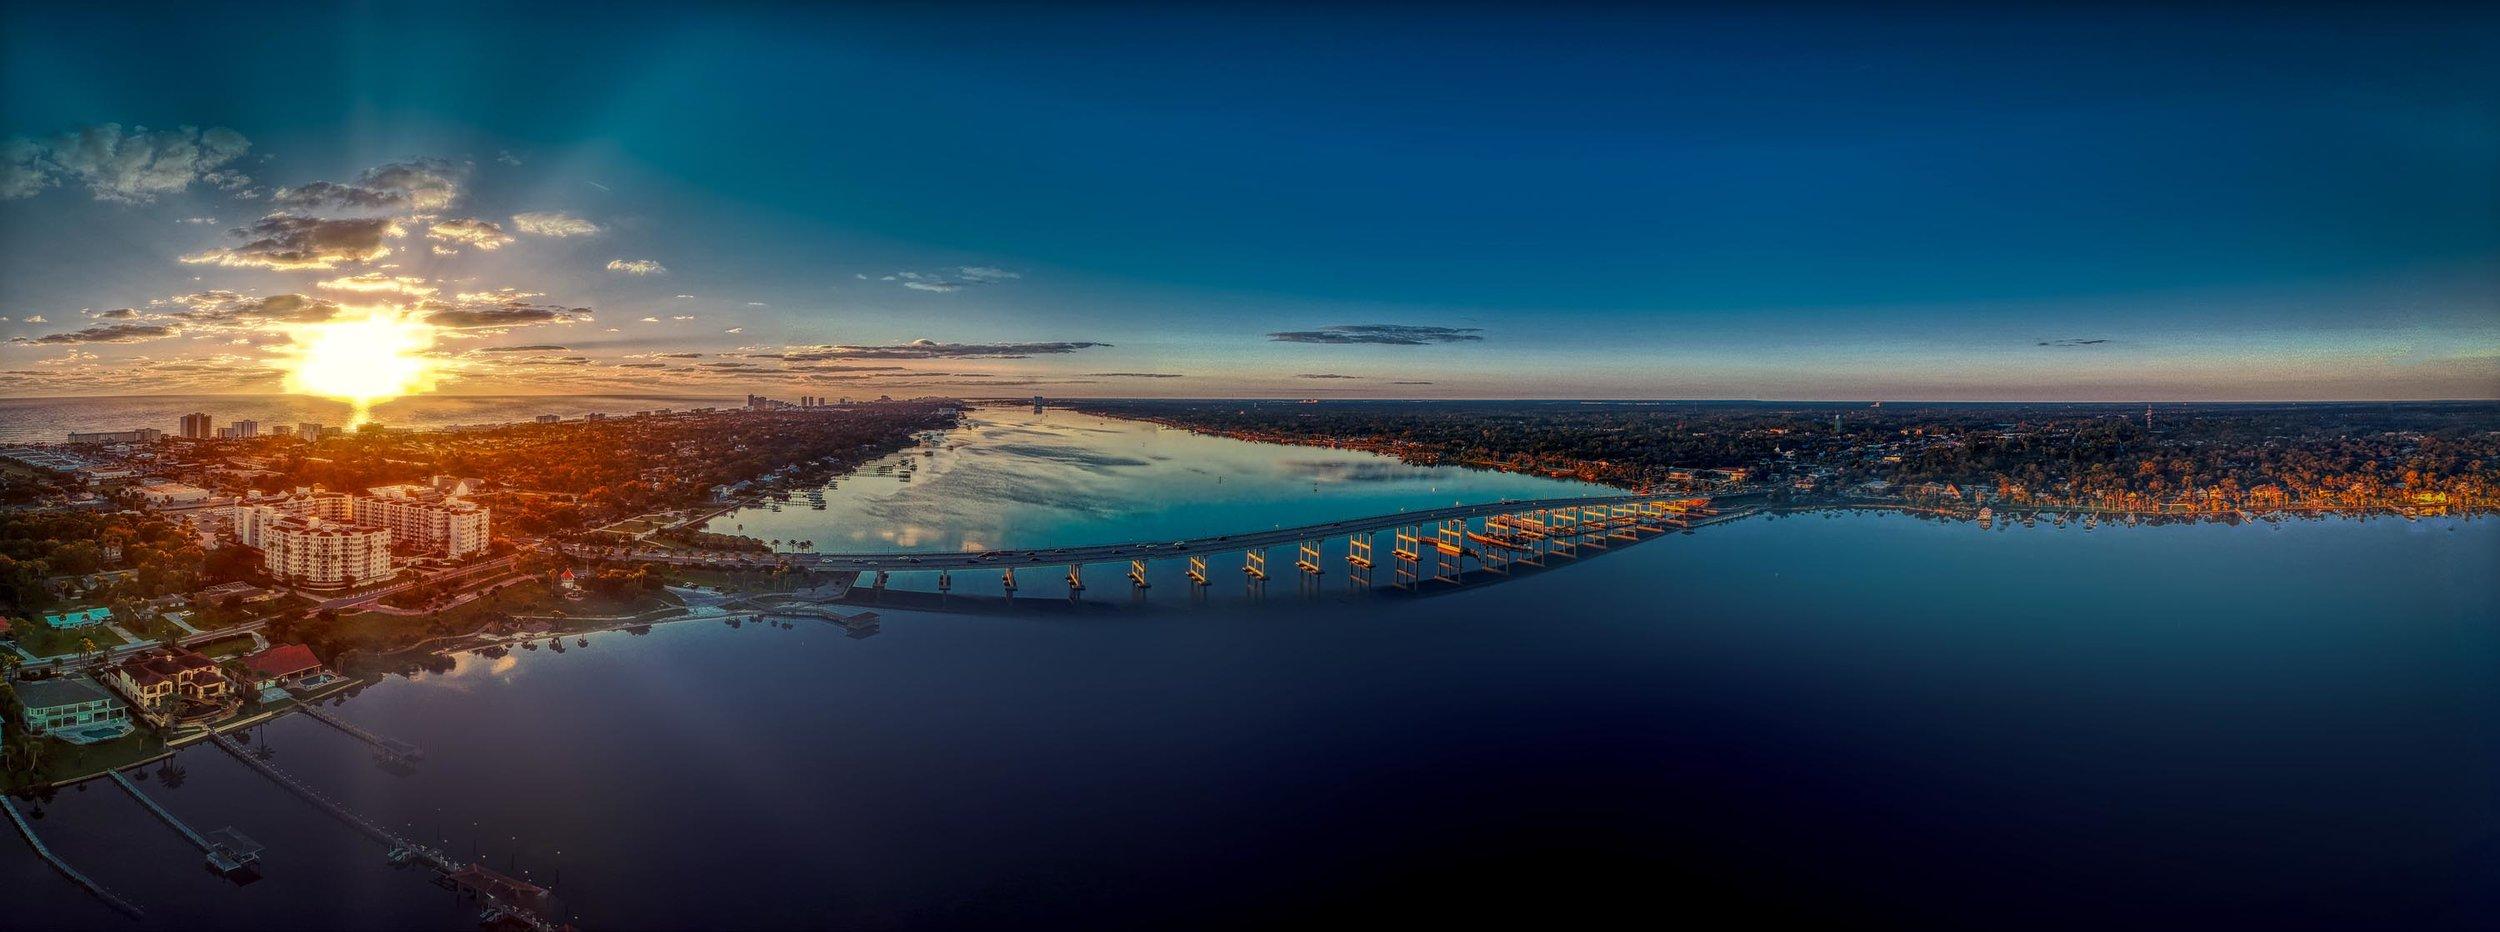 Panorama sunrise ormond bridge 2 copy.jpg